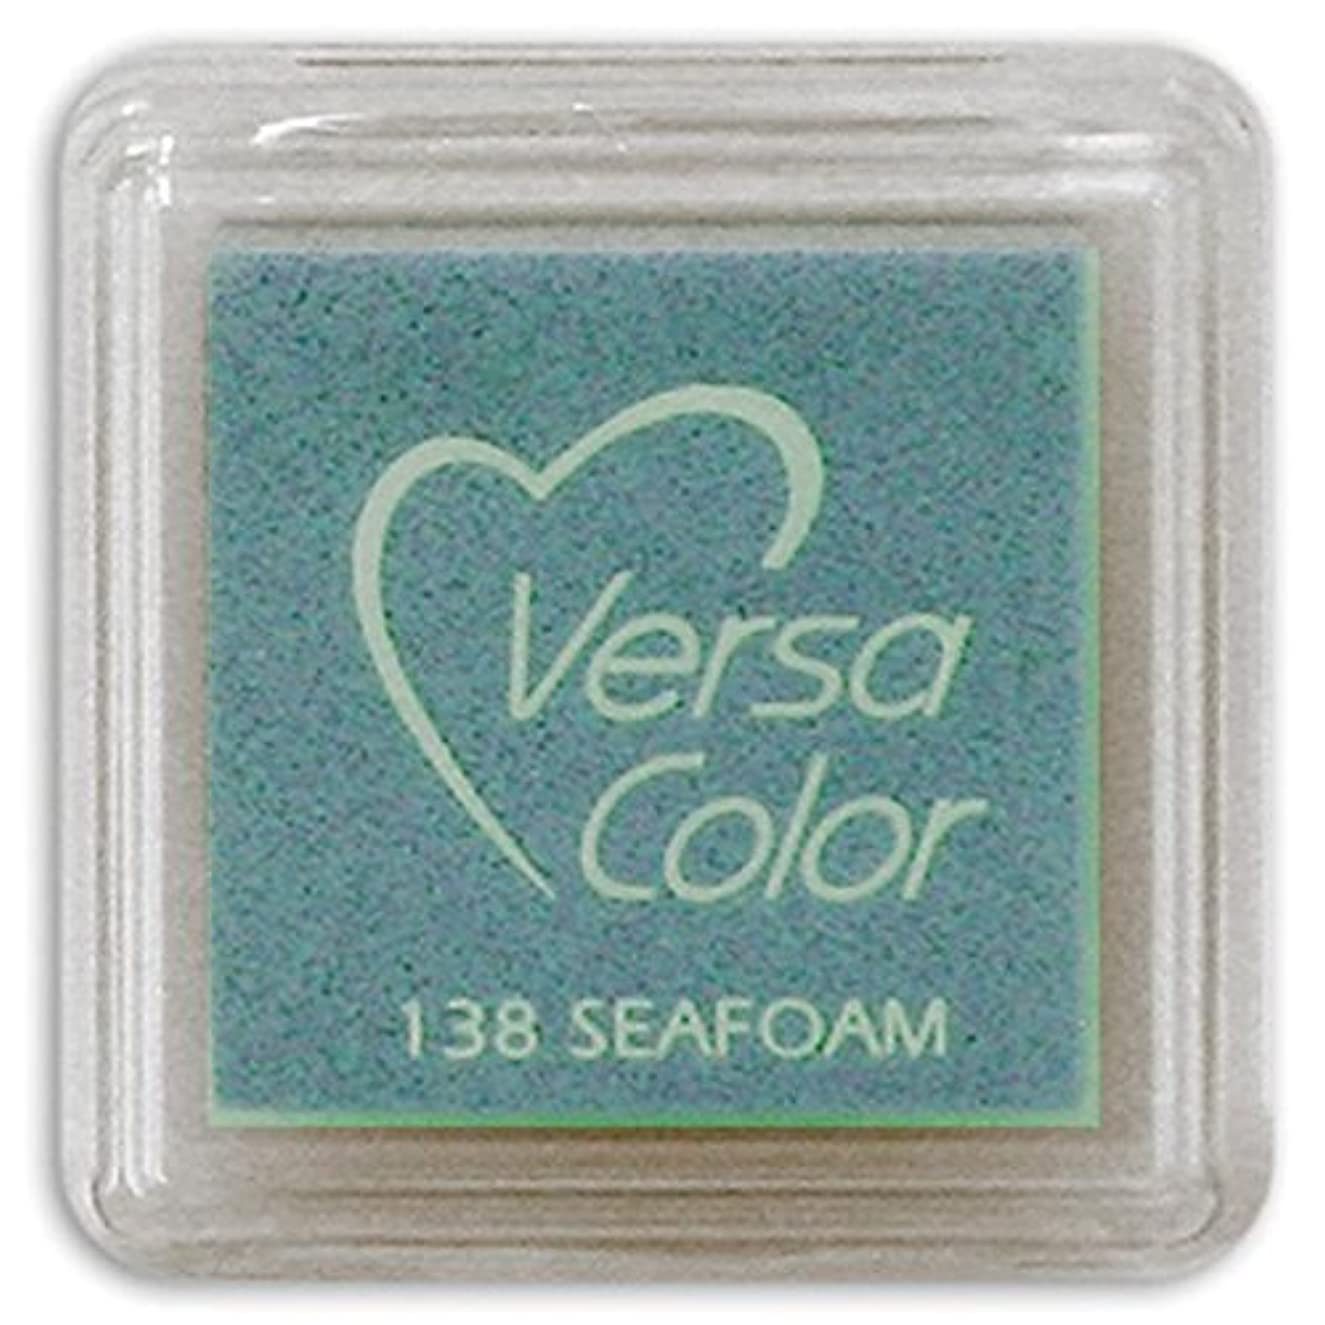 Tsukineko Small-Size VersaColor Ultimate Pigment Inkpad, Seafoam